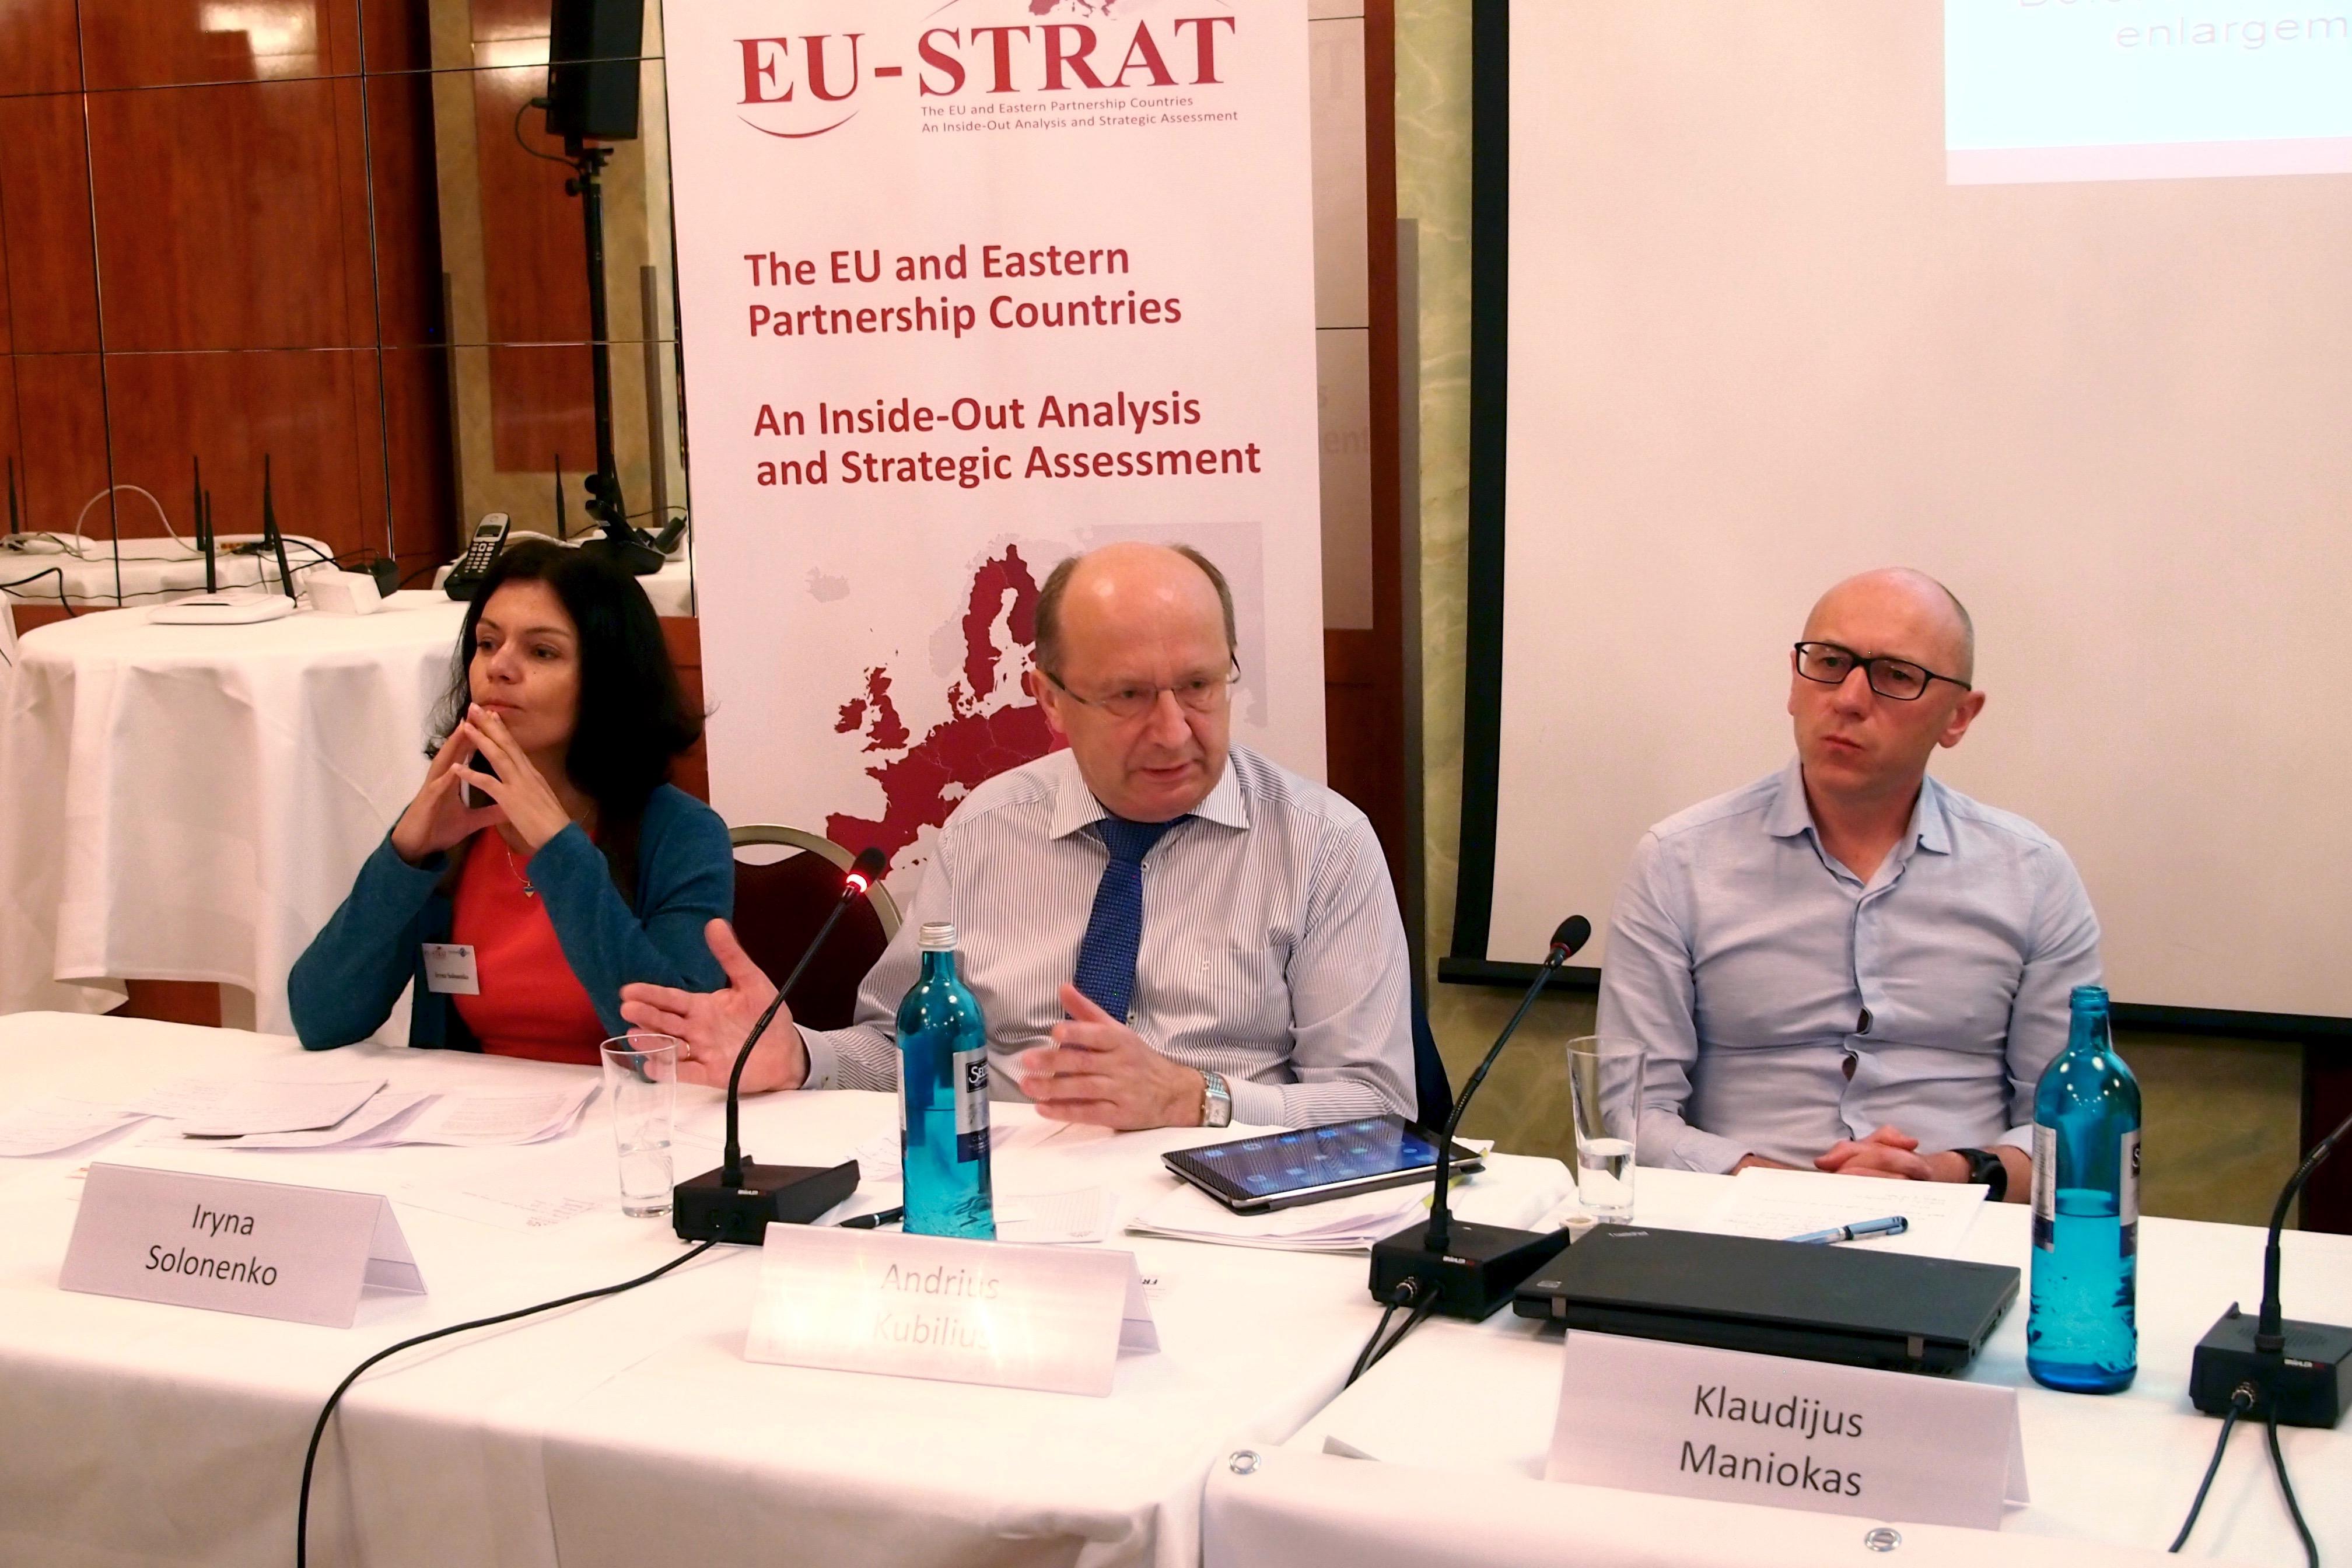 eu-strat conference6